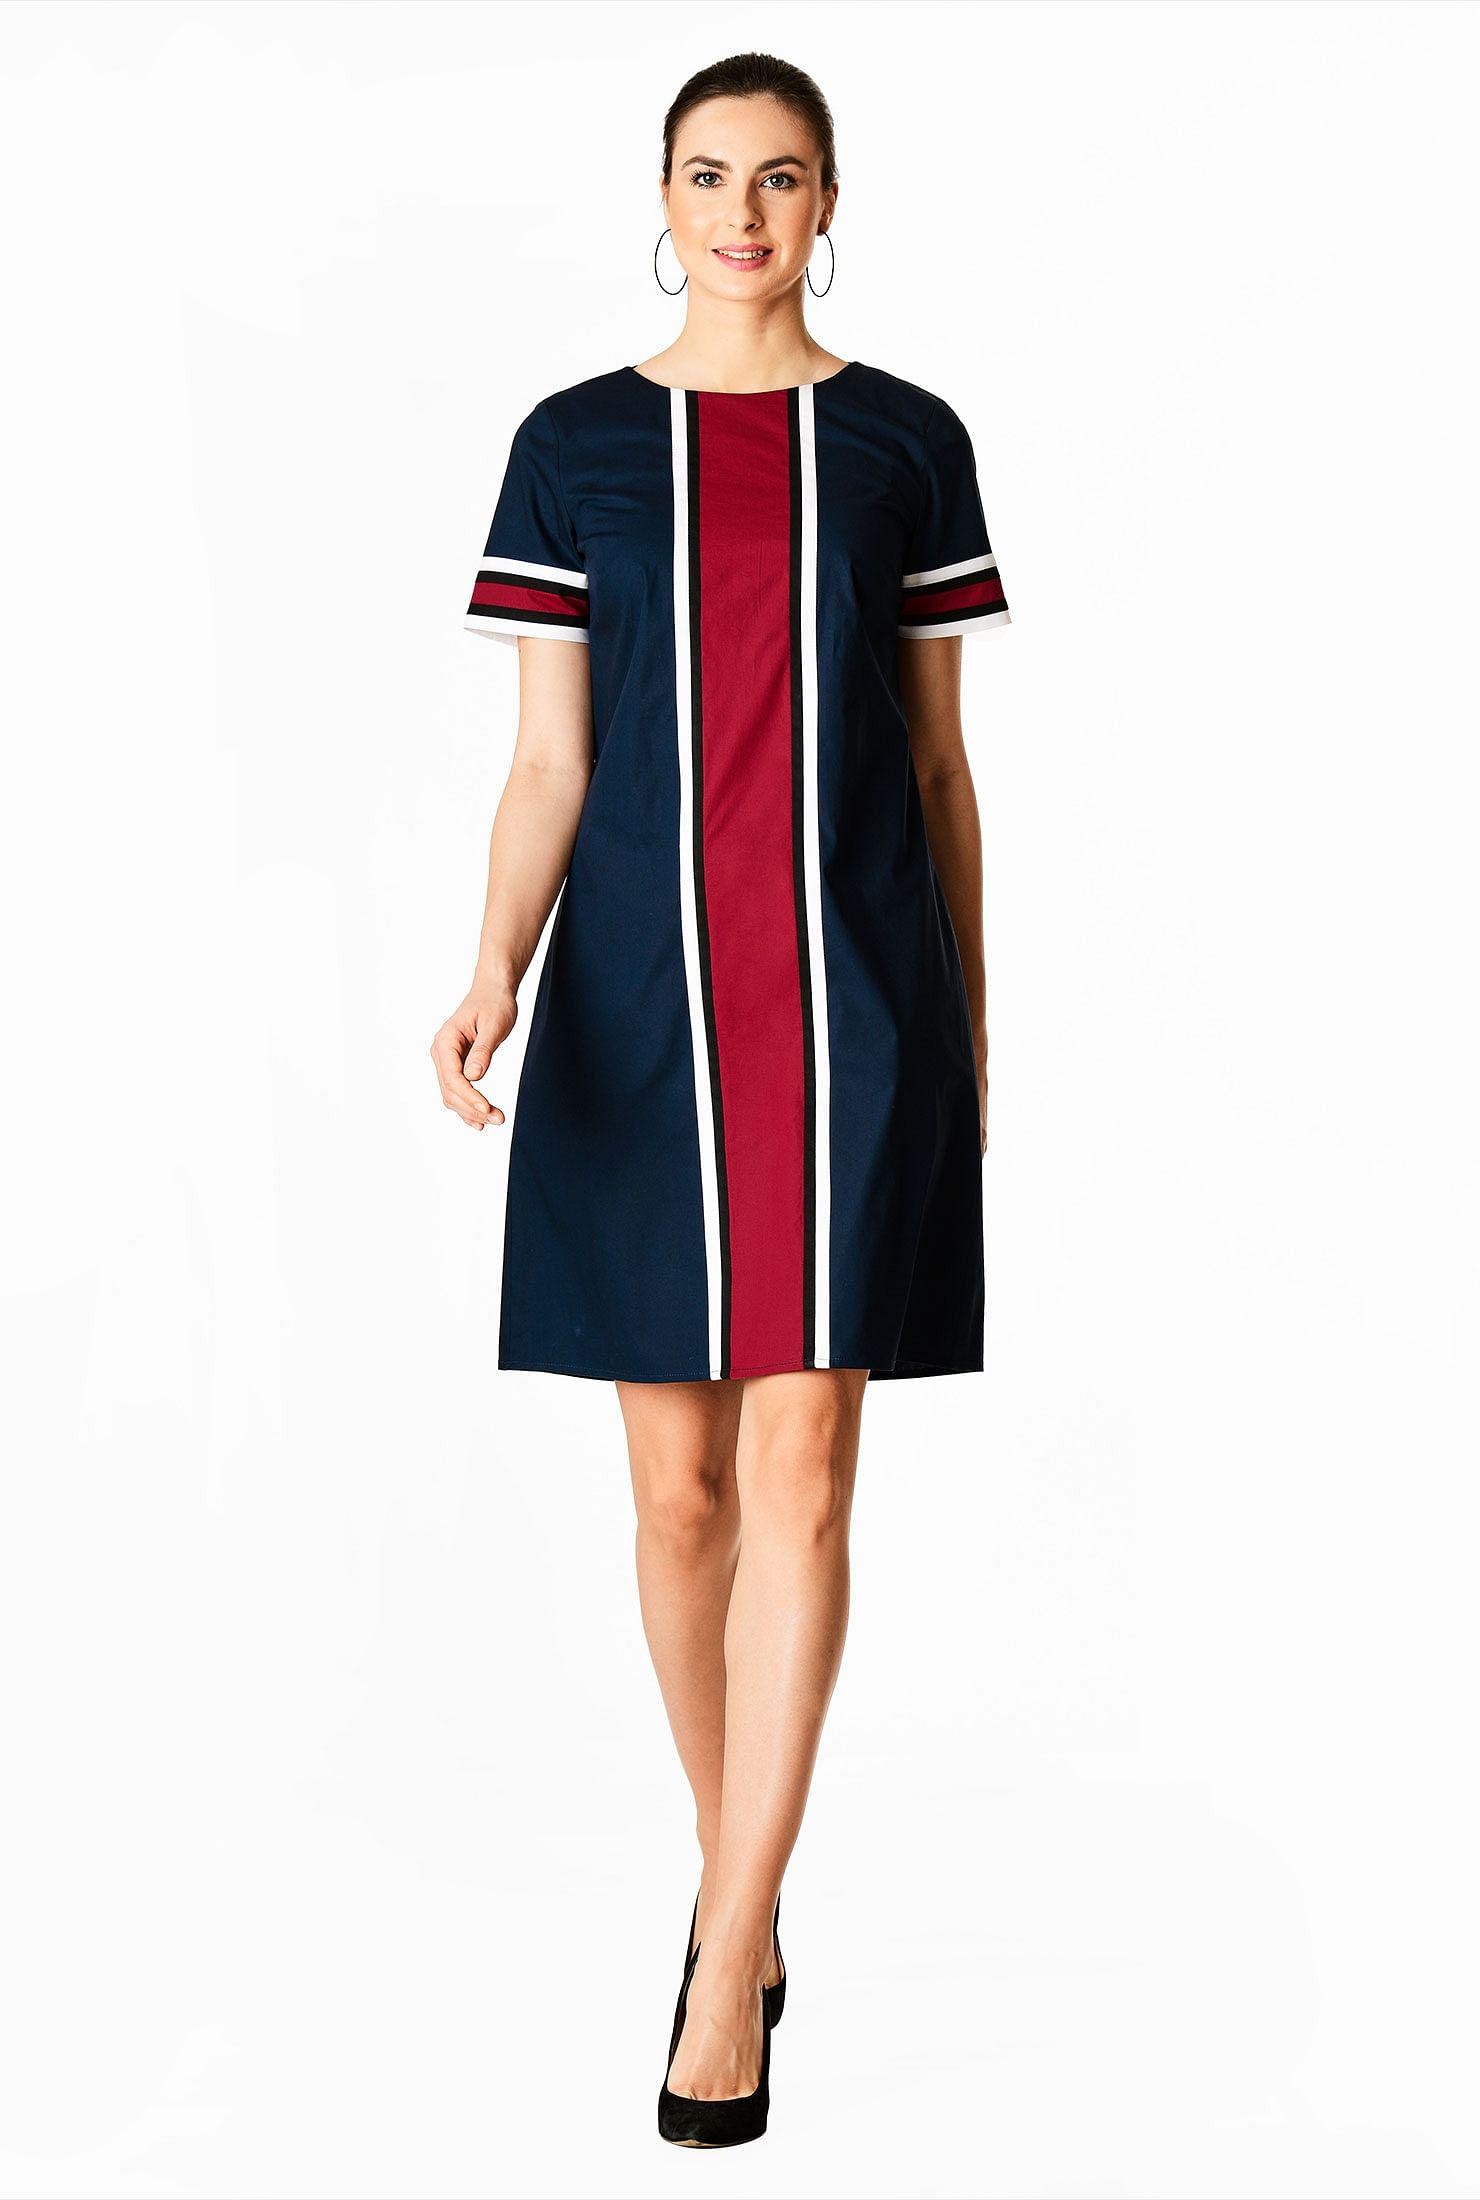 60s Dresses | 1960s Dresses Mod, Mini, Hippie Contrast linear stripe poplin dress $54.95 AT vintagedancer.com